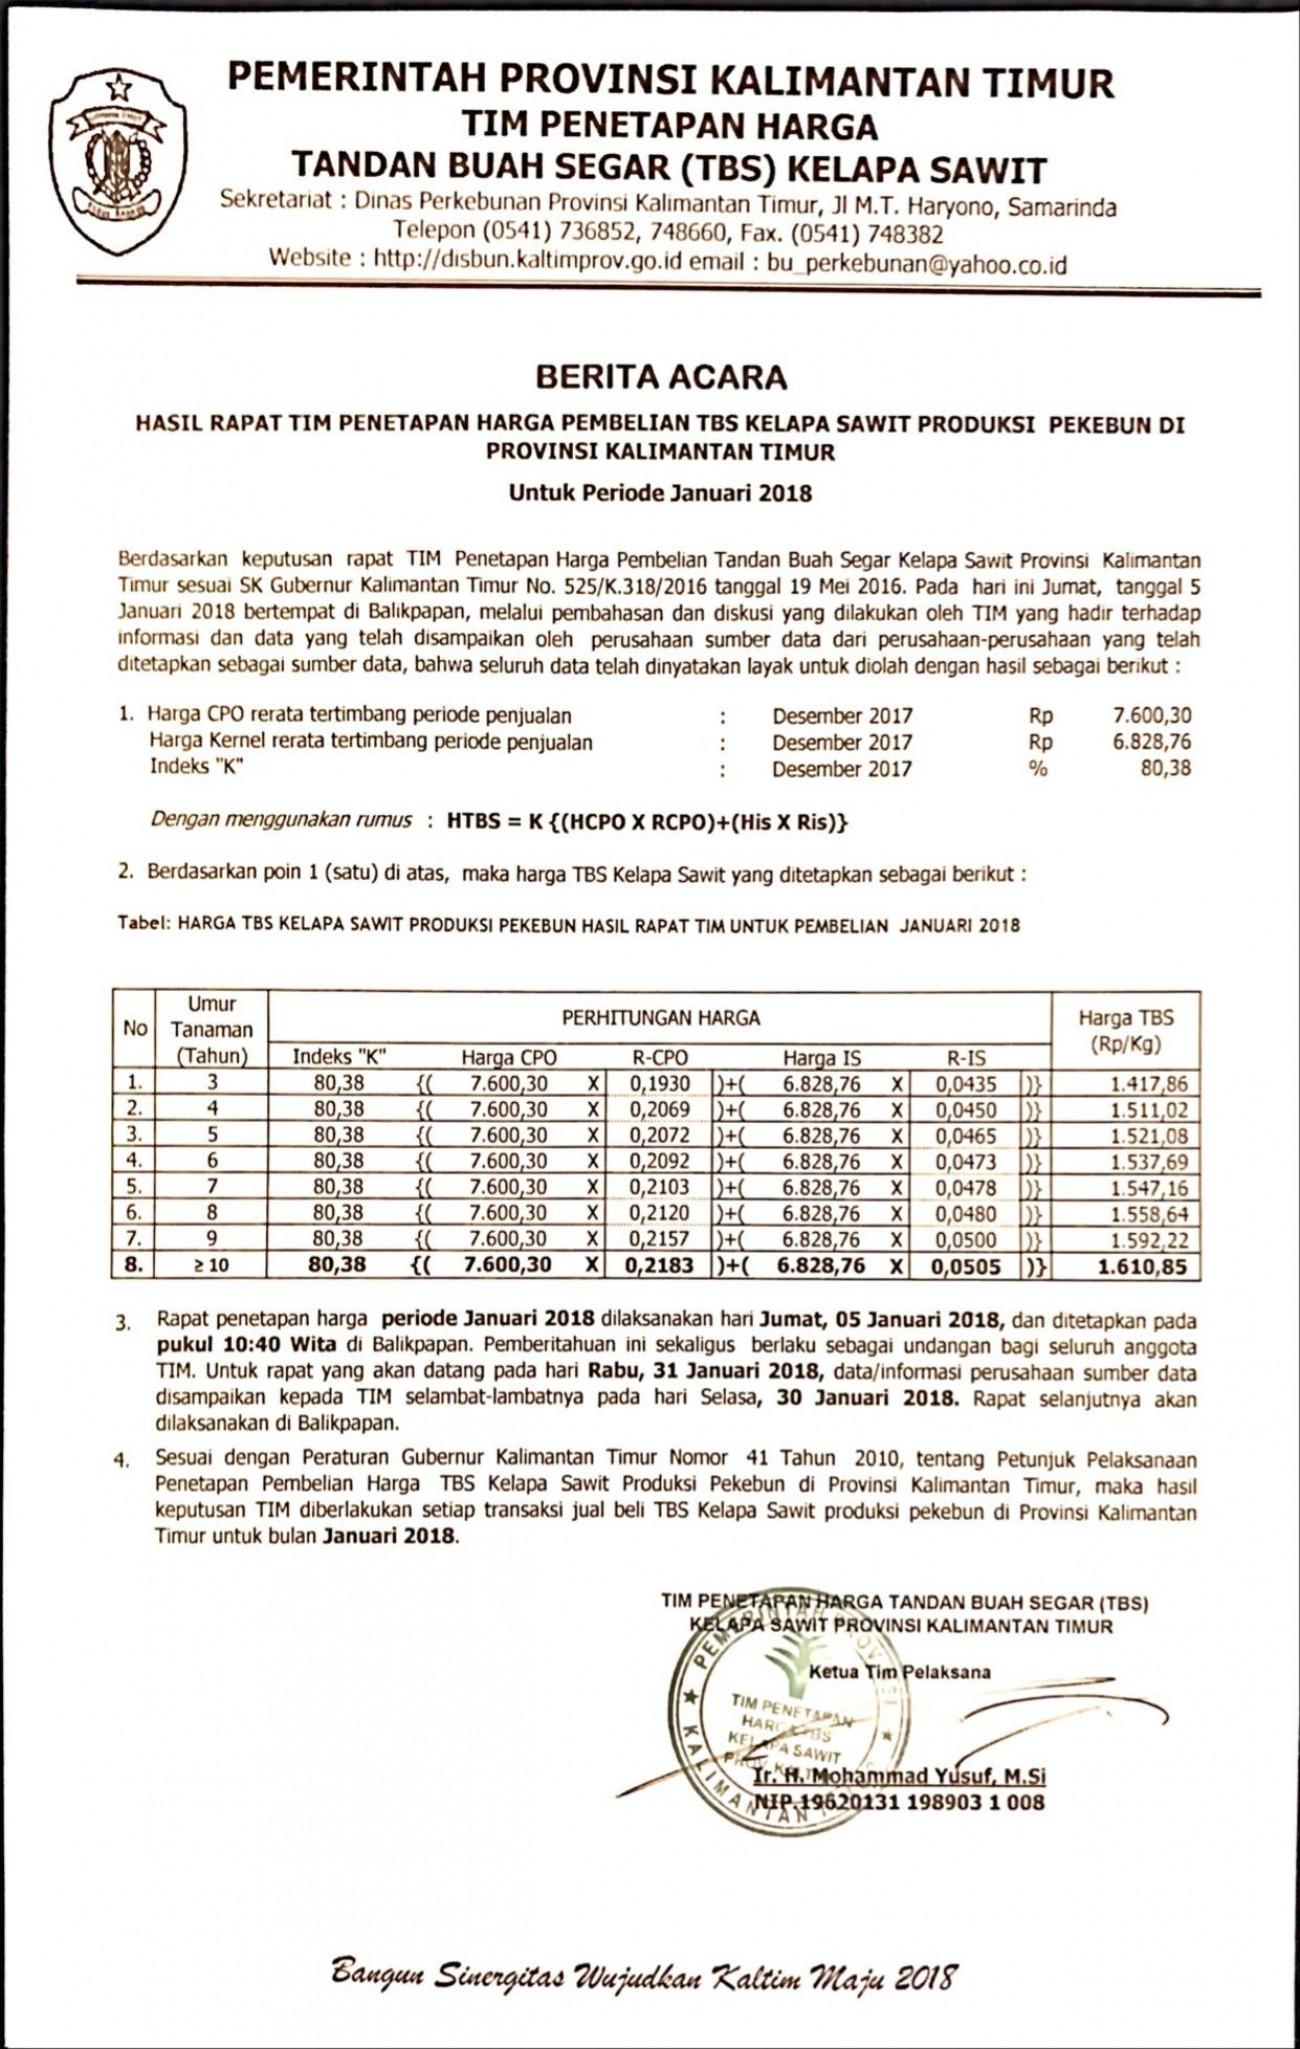 Informasi Harga TBS Kelapa Sawit Bulan Januari 2018